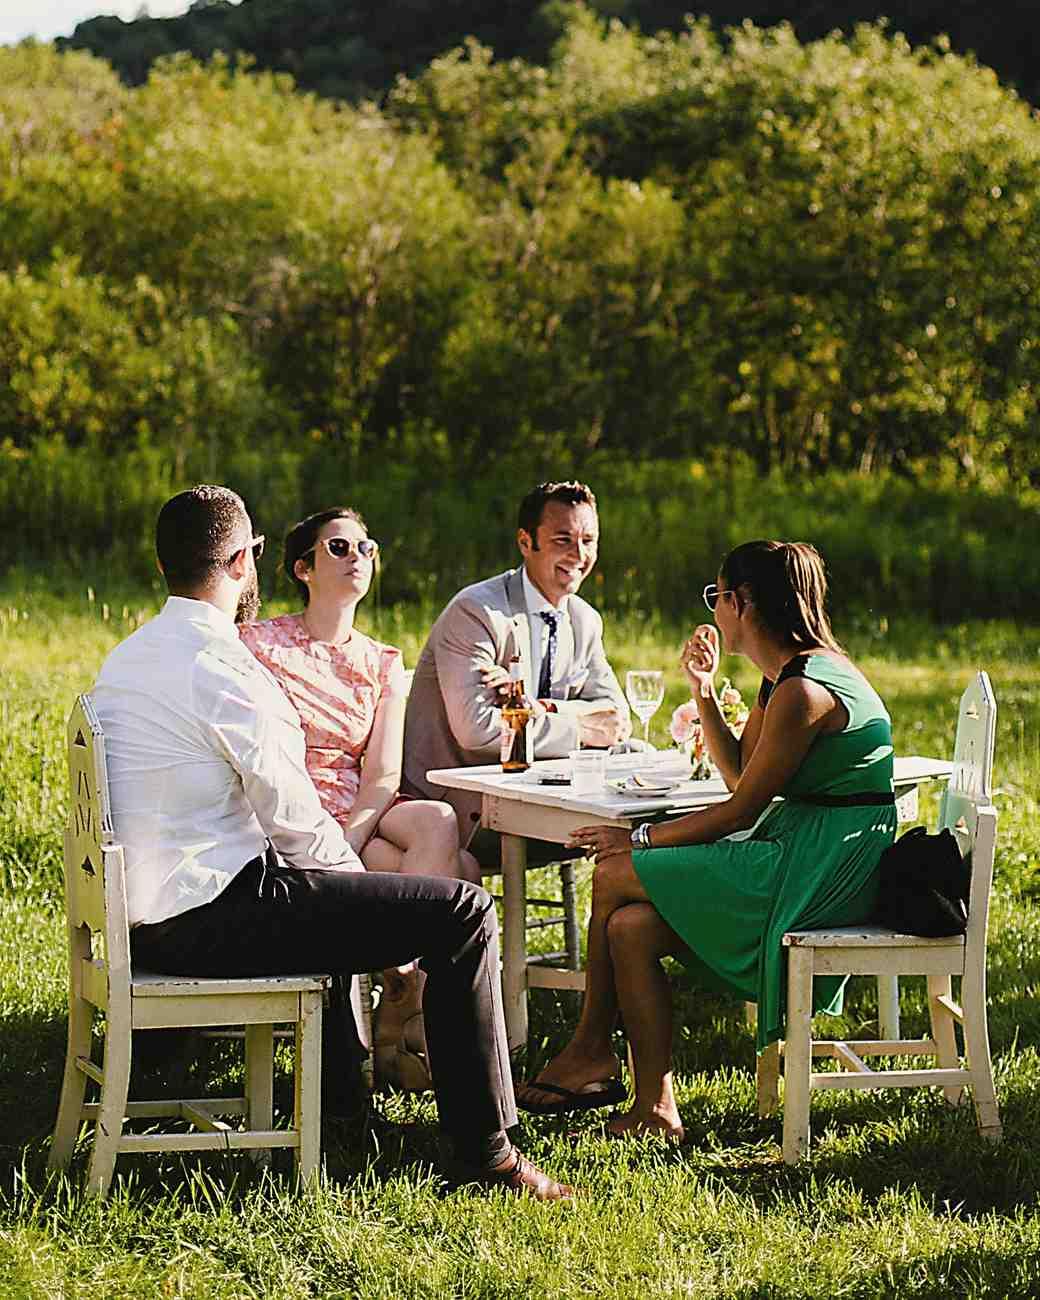 cf9863170147 15 πρωτότυπες ιδέες για καλοκαιρινούς γάμους